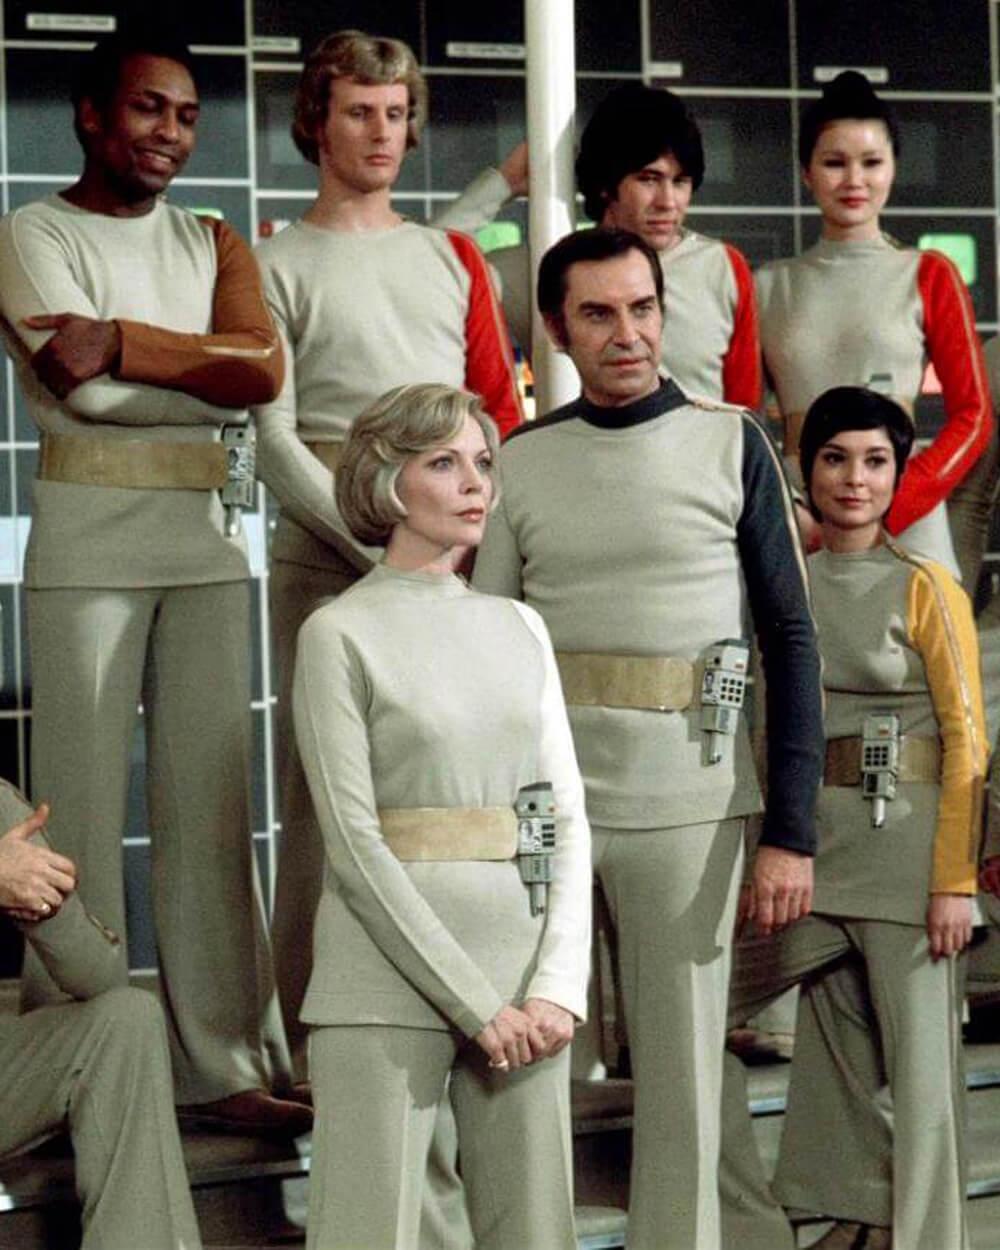 Space:1999 movie series' Androgynous Fashion by Rudi Gernreich.